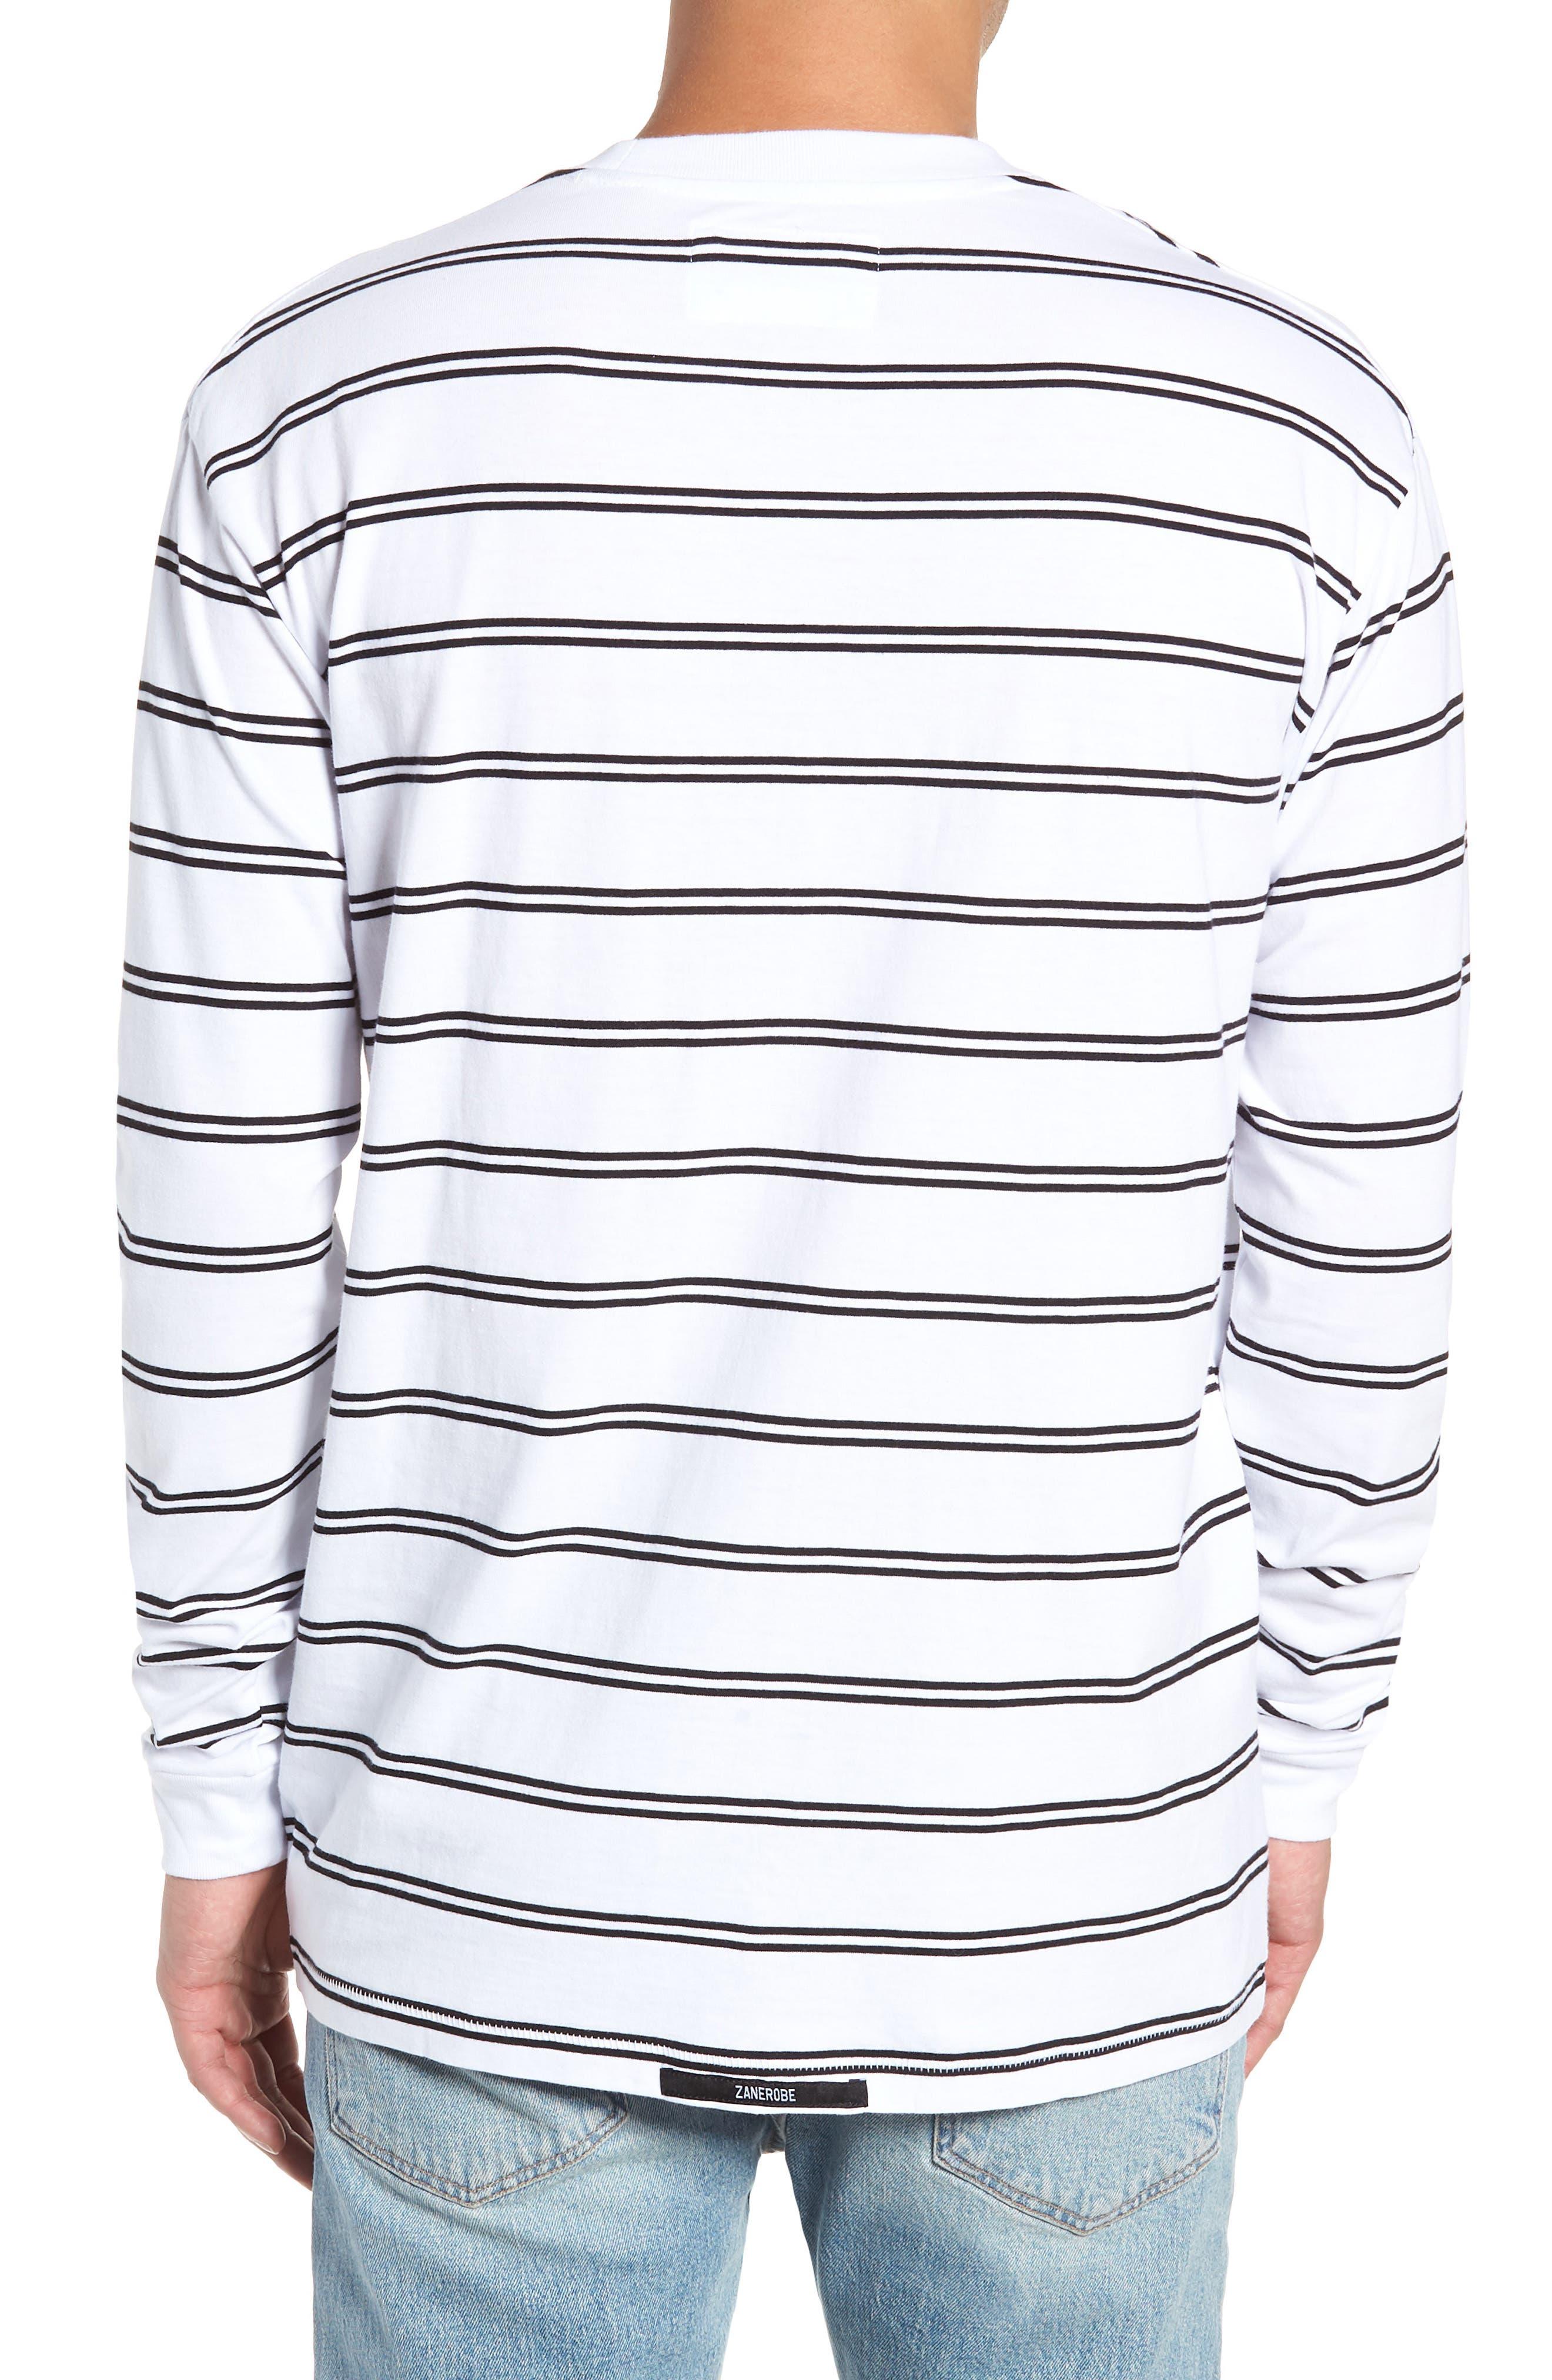 Channel Box Long Sleeve T-Shirt,                             Alternate thumbnail 2, color,                             100